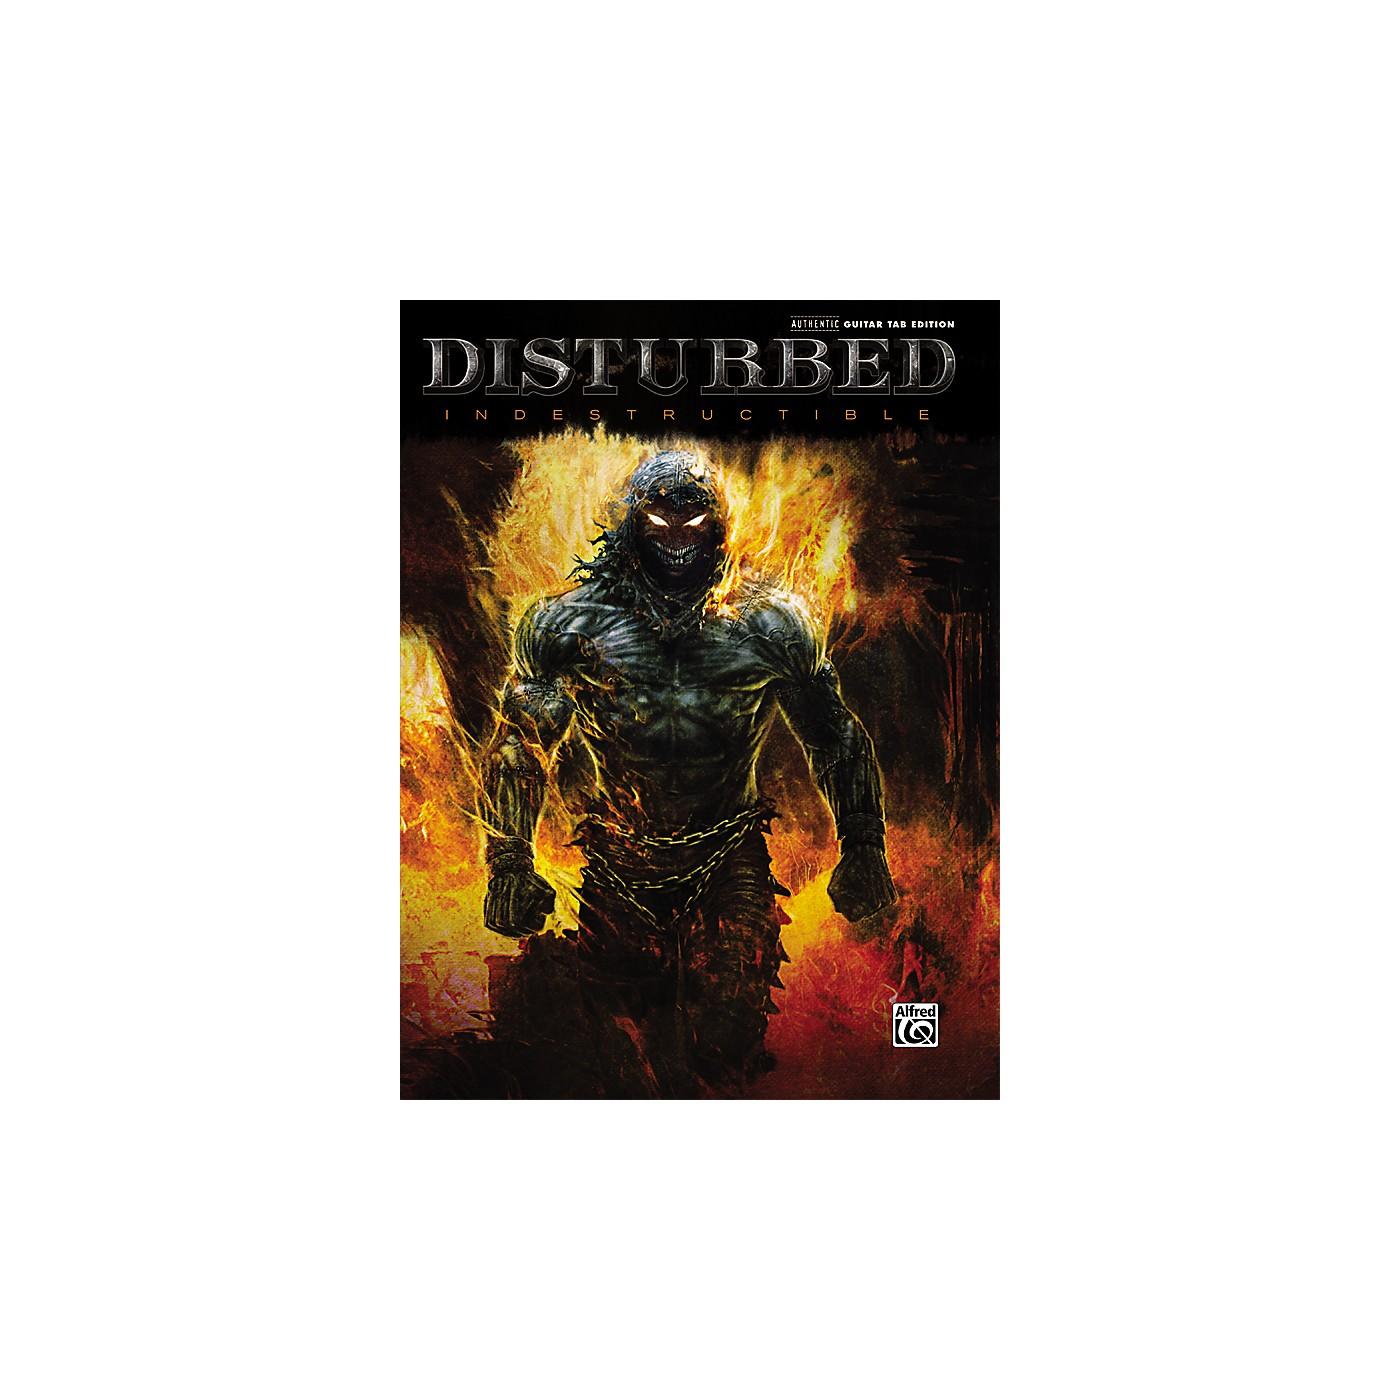 Hal Leonard Disturbed Indestructible Guitar TAB thumbnail